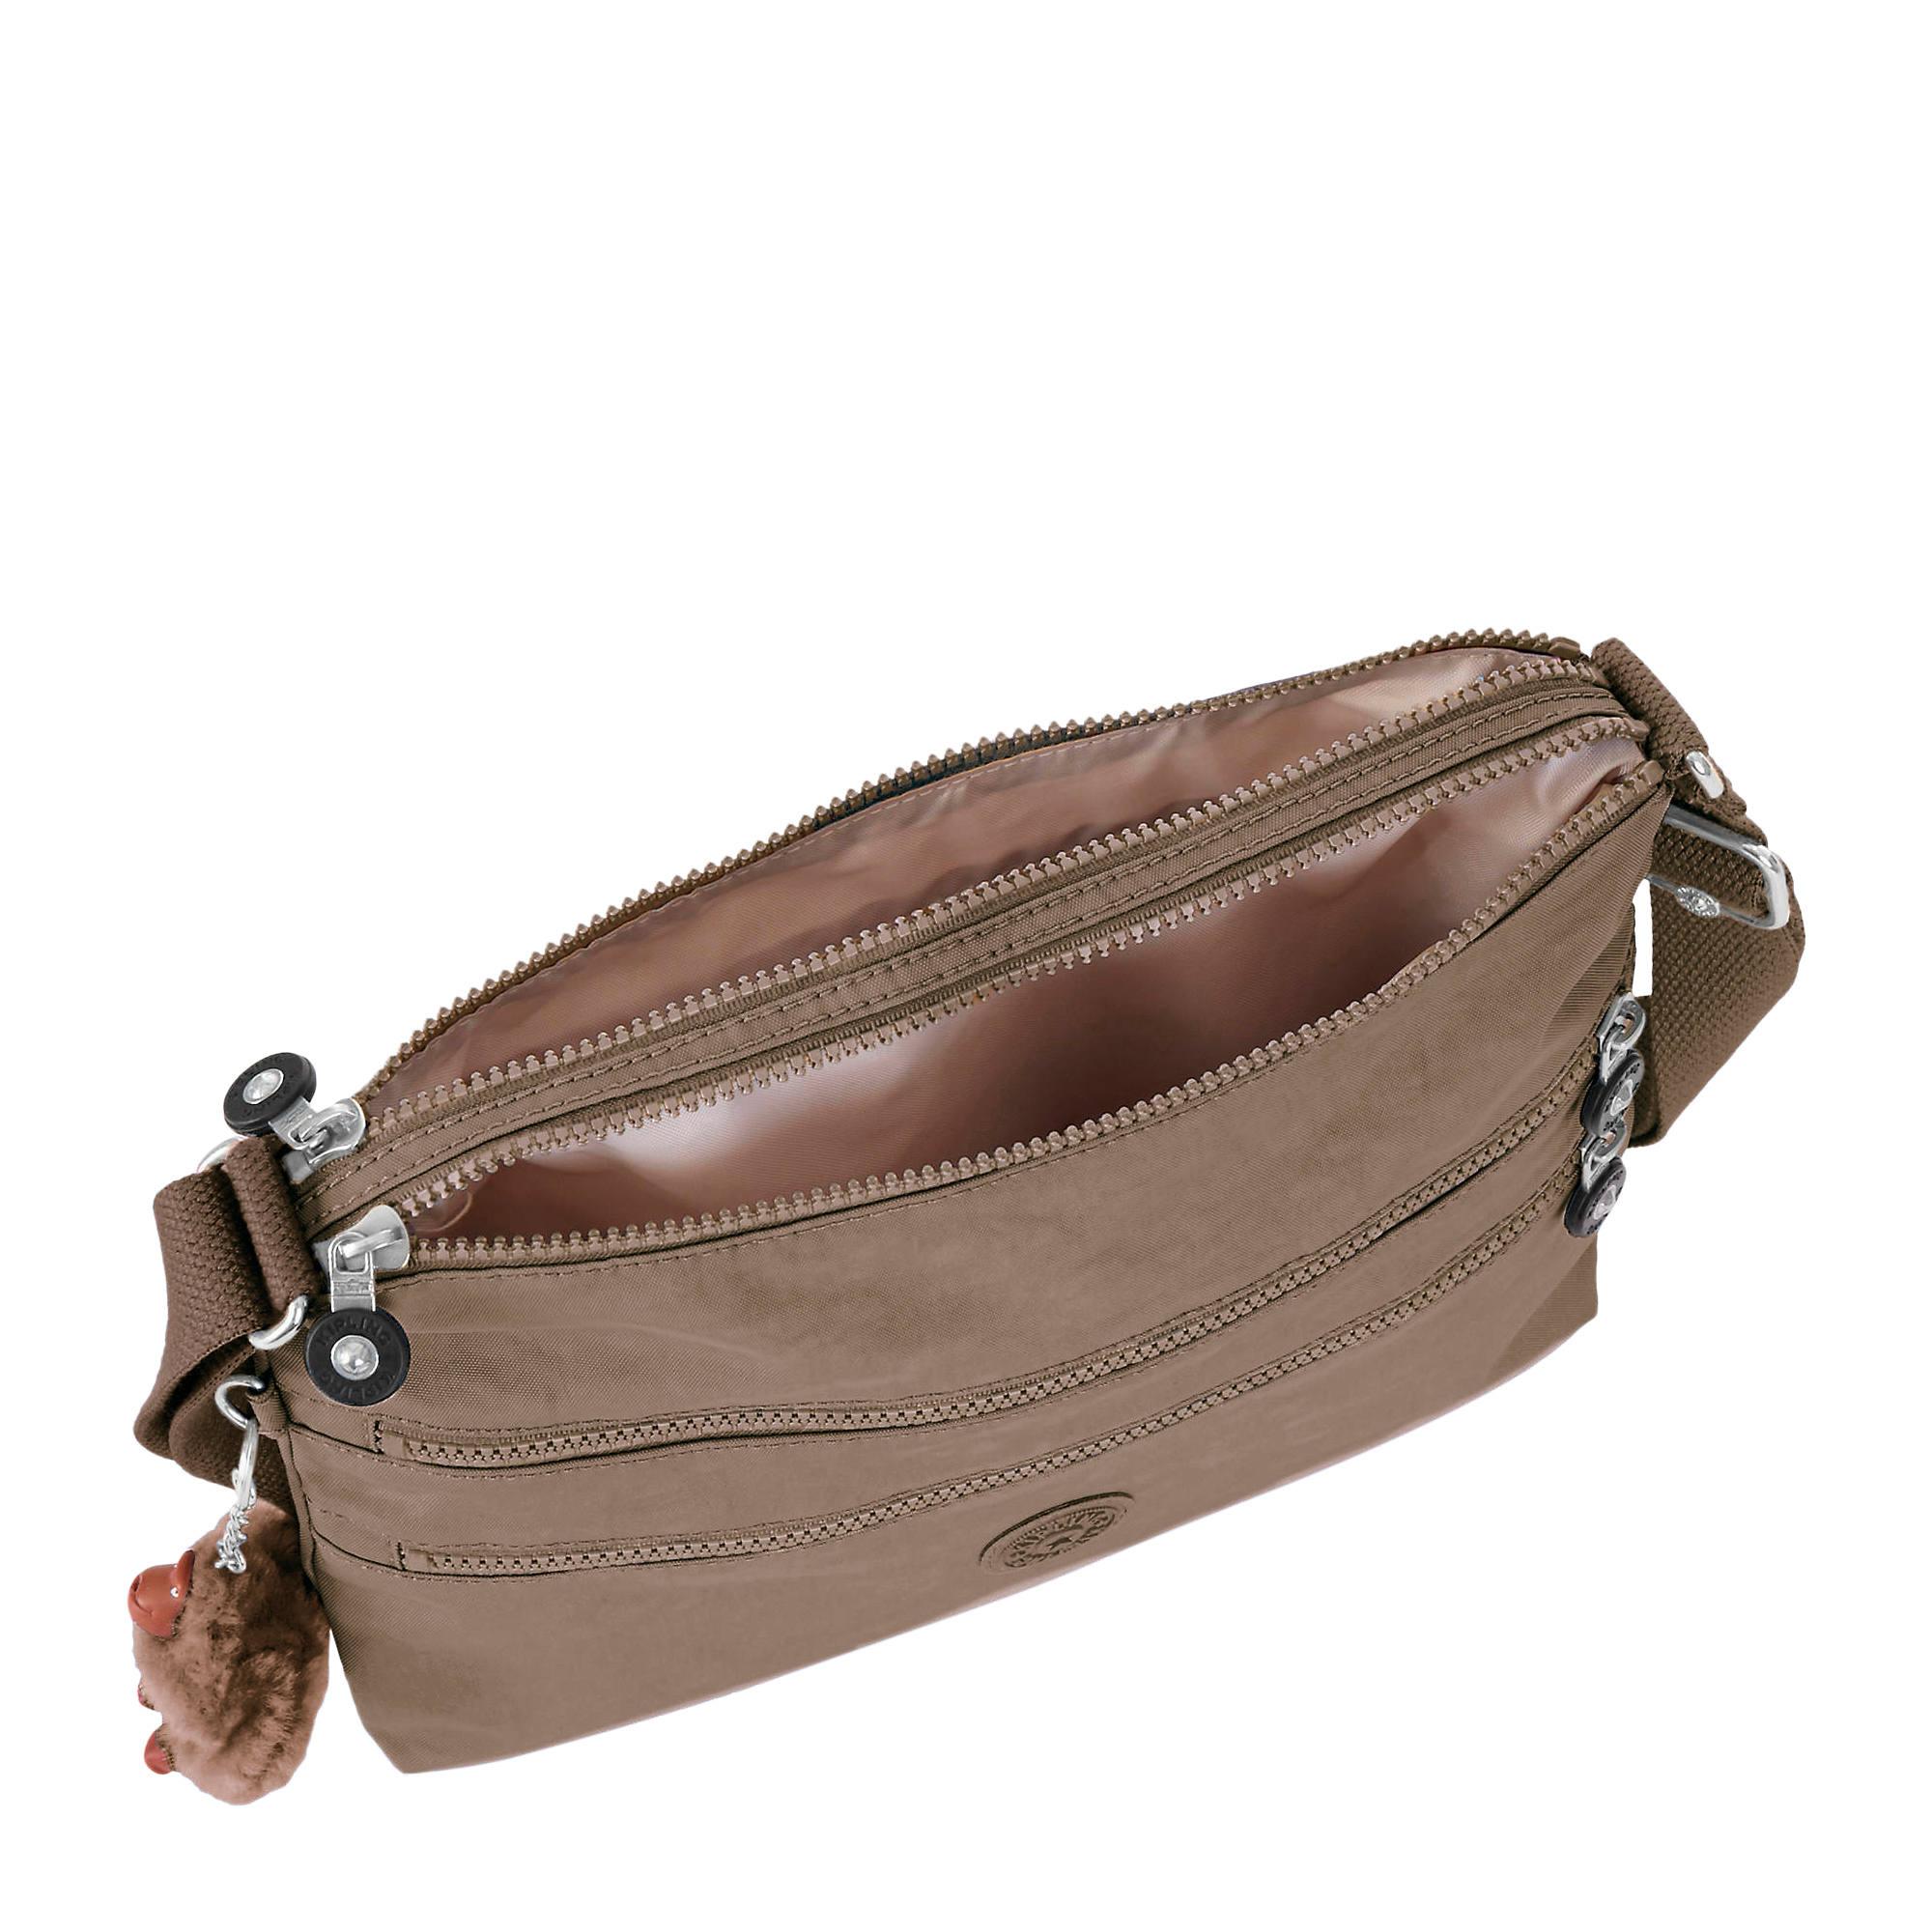 Kipling-Alvar-Metallic-Crossbody-Bag miniature 41